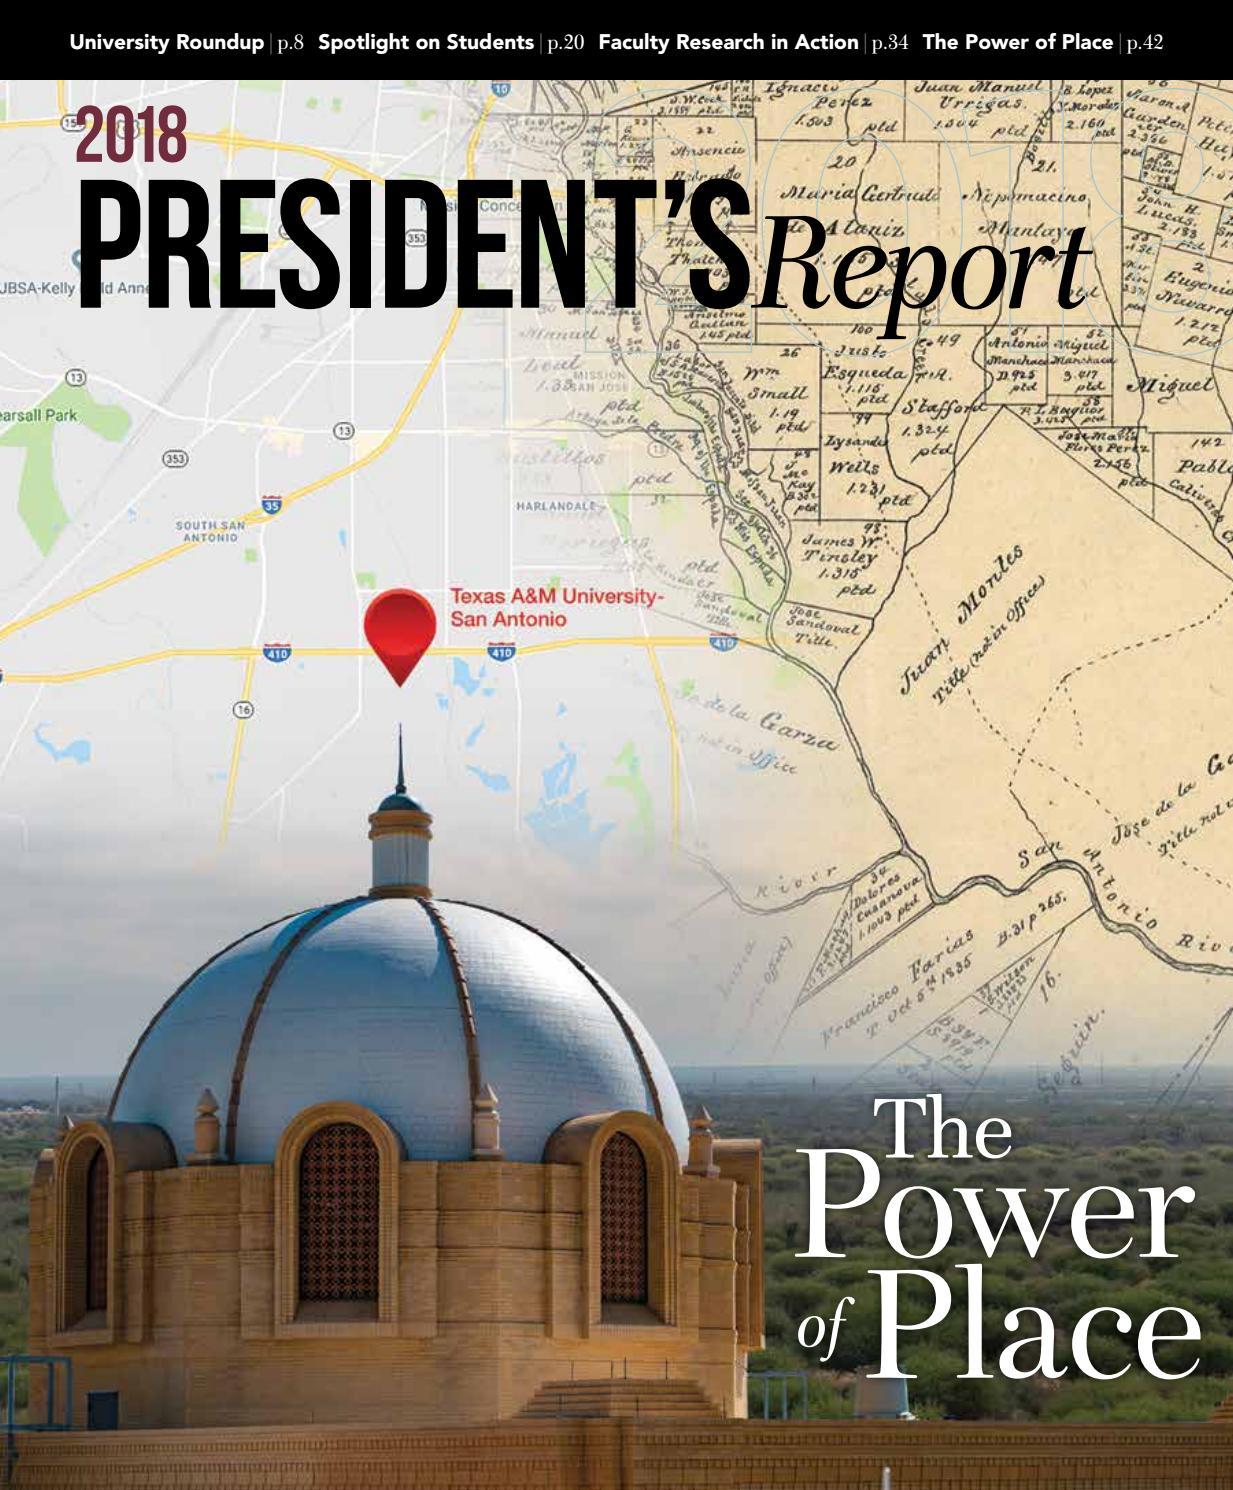 2018 Texas A&M University-San Antonio President's Report by